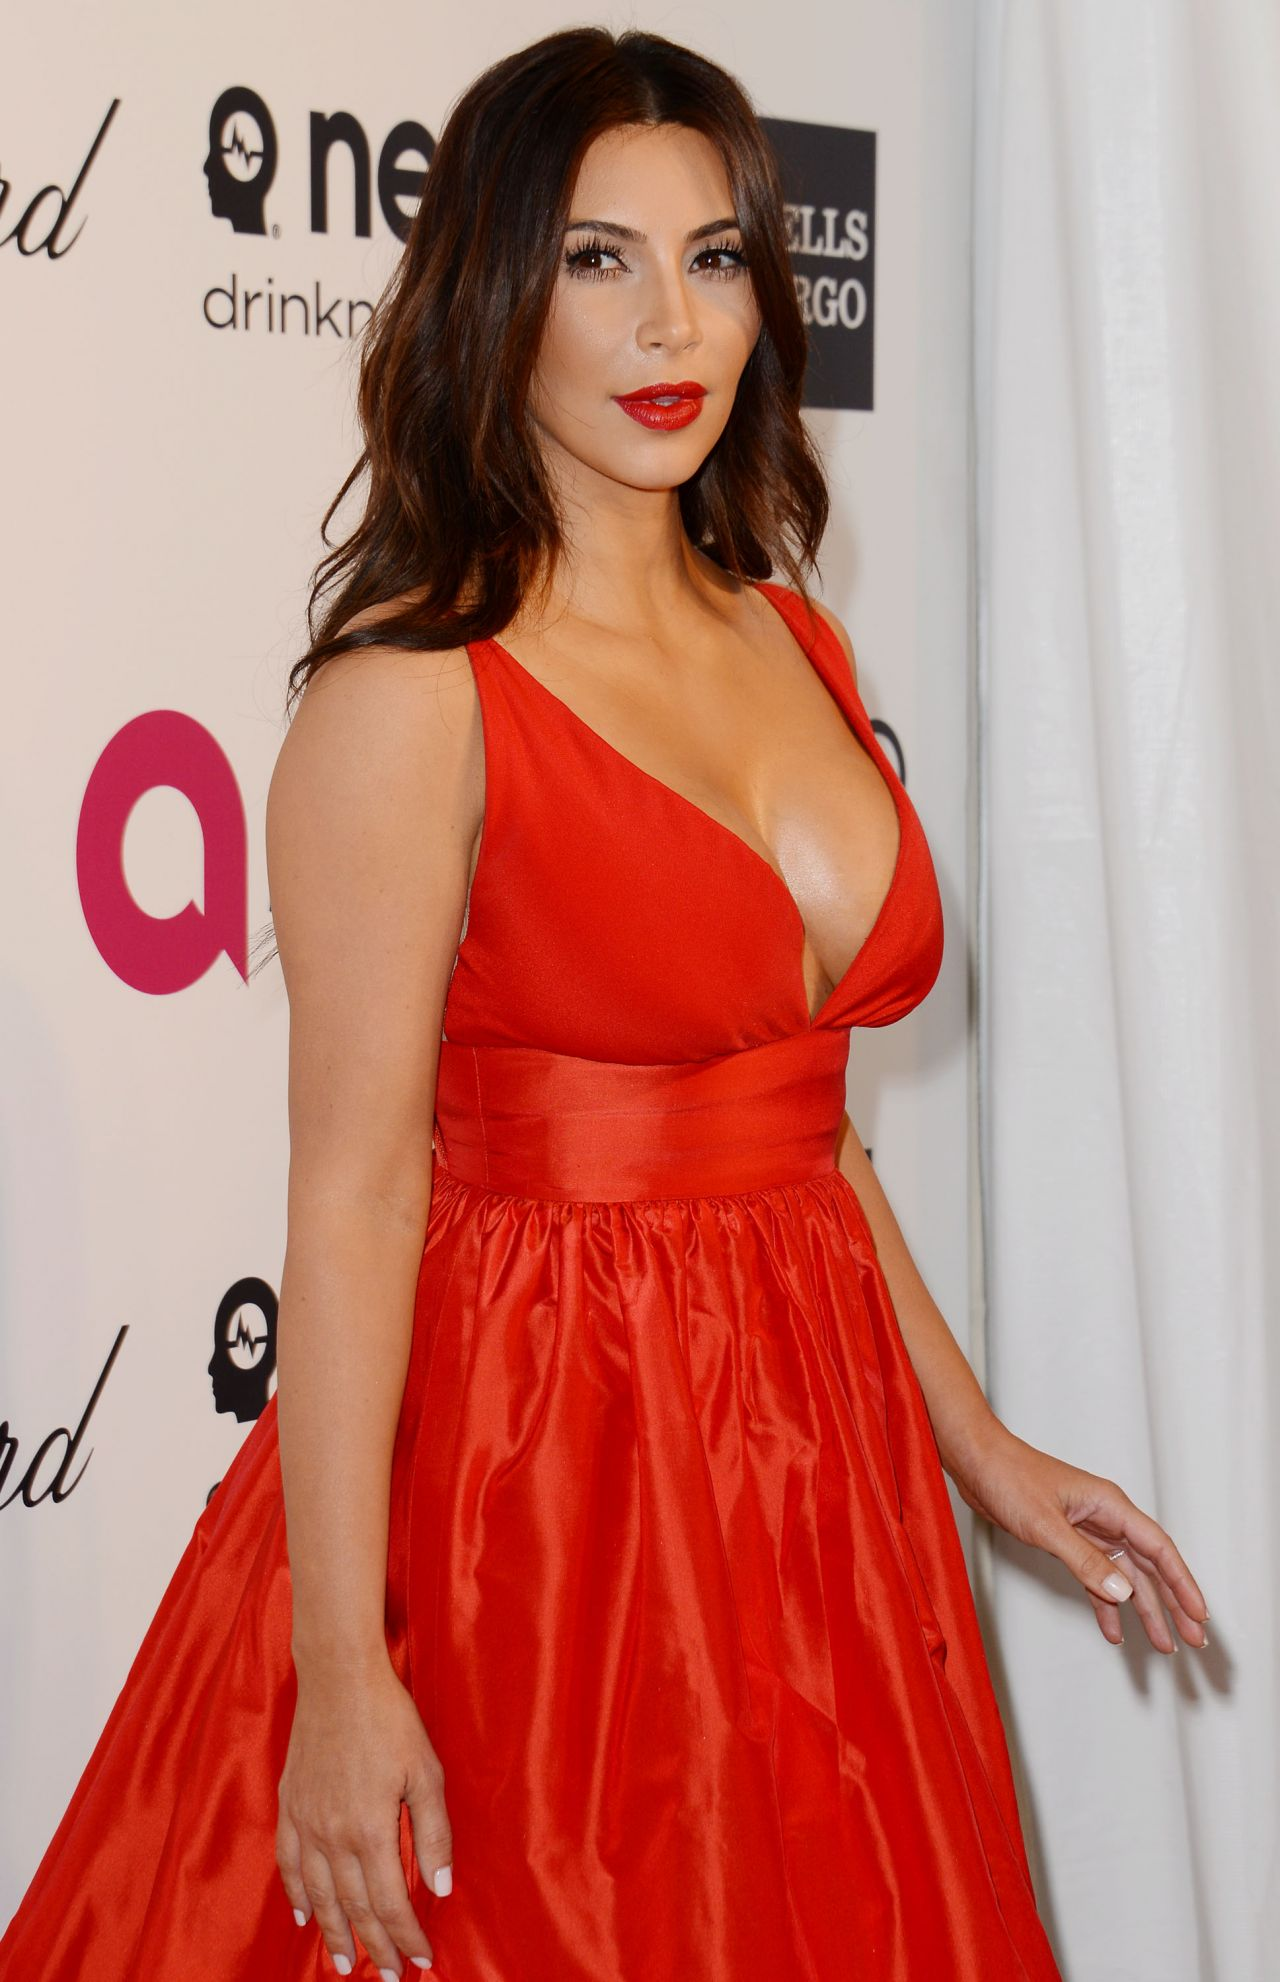 kim kardashian red carpet dresses 2016-2017 | B2B Fashion  |Kim Kardashian Red Carpet Dresses